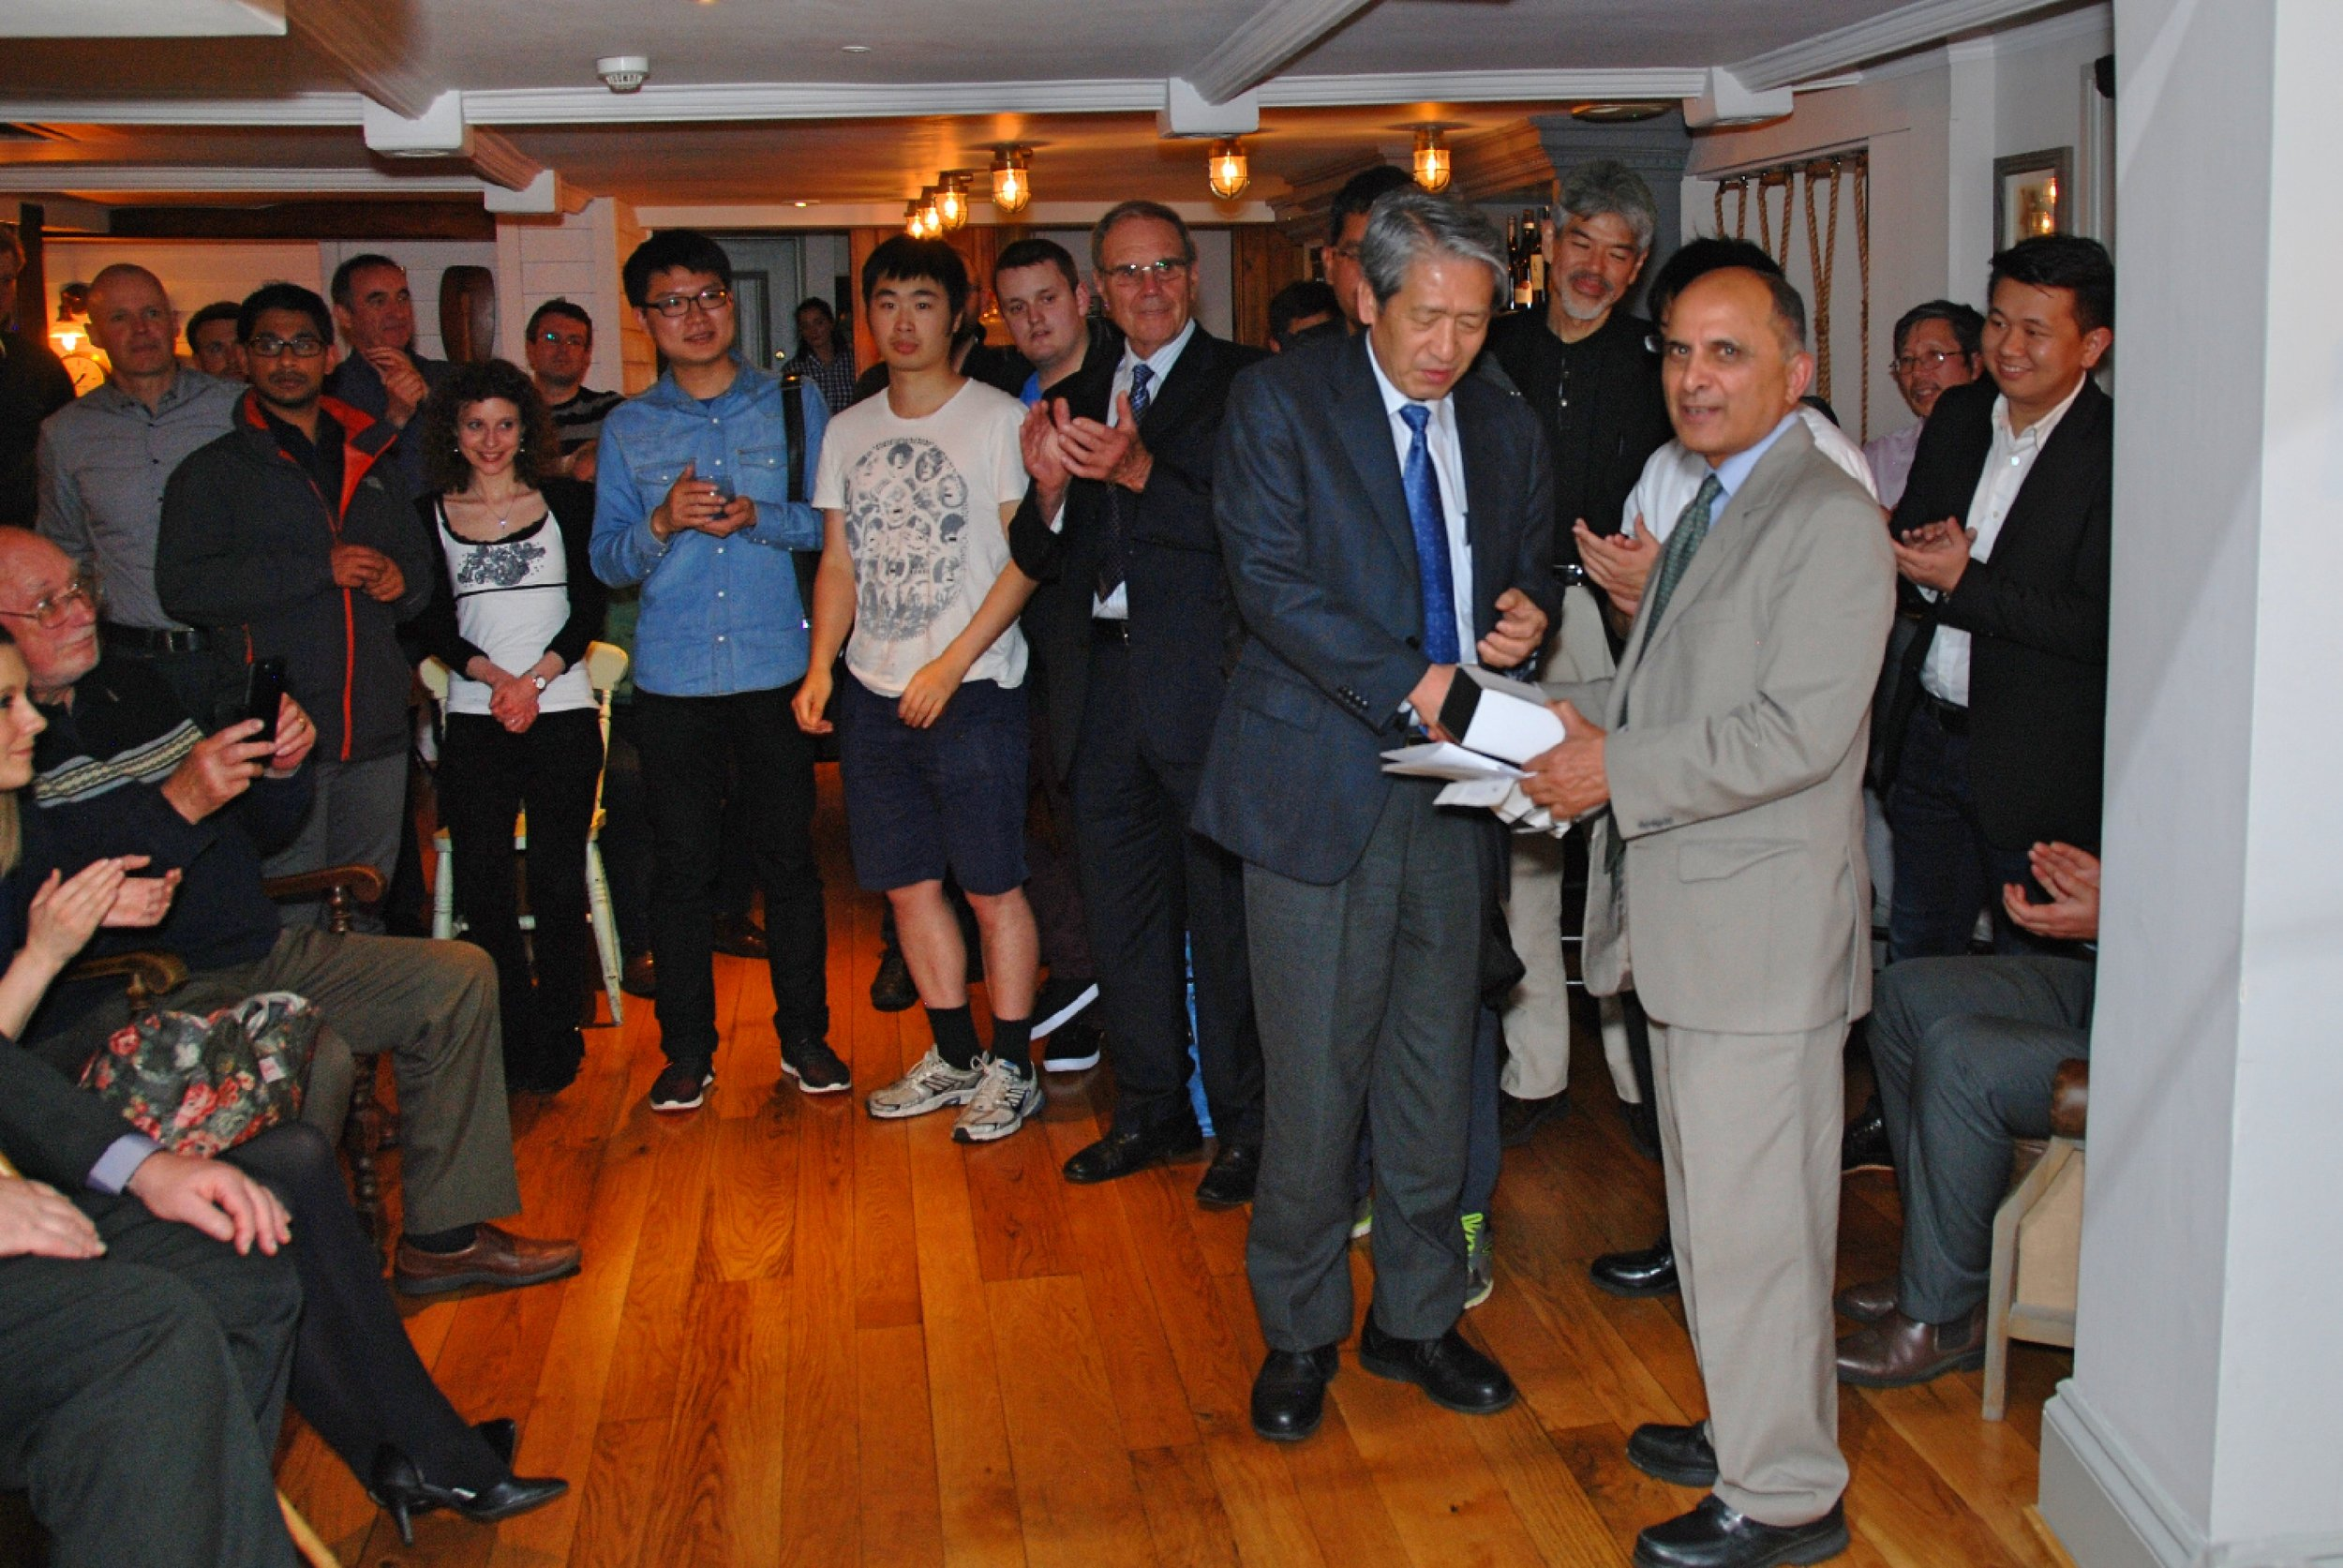 Prof. Fujimitsu Masuyama receiving the award on behalf on Dr. Yasushi Hasegawa of Nippon Steel & Sumitomo Metal, Japan